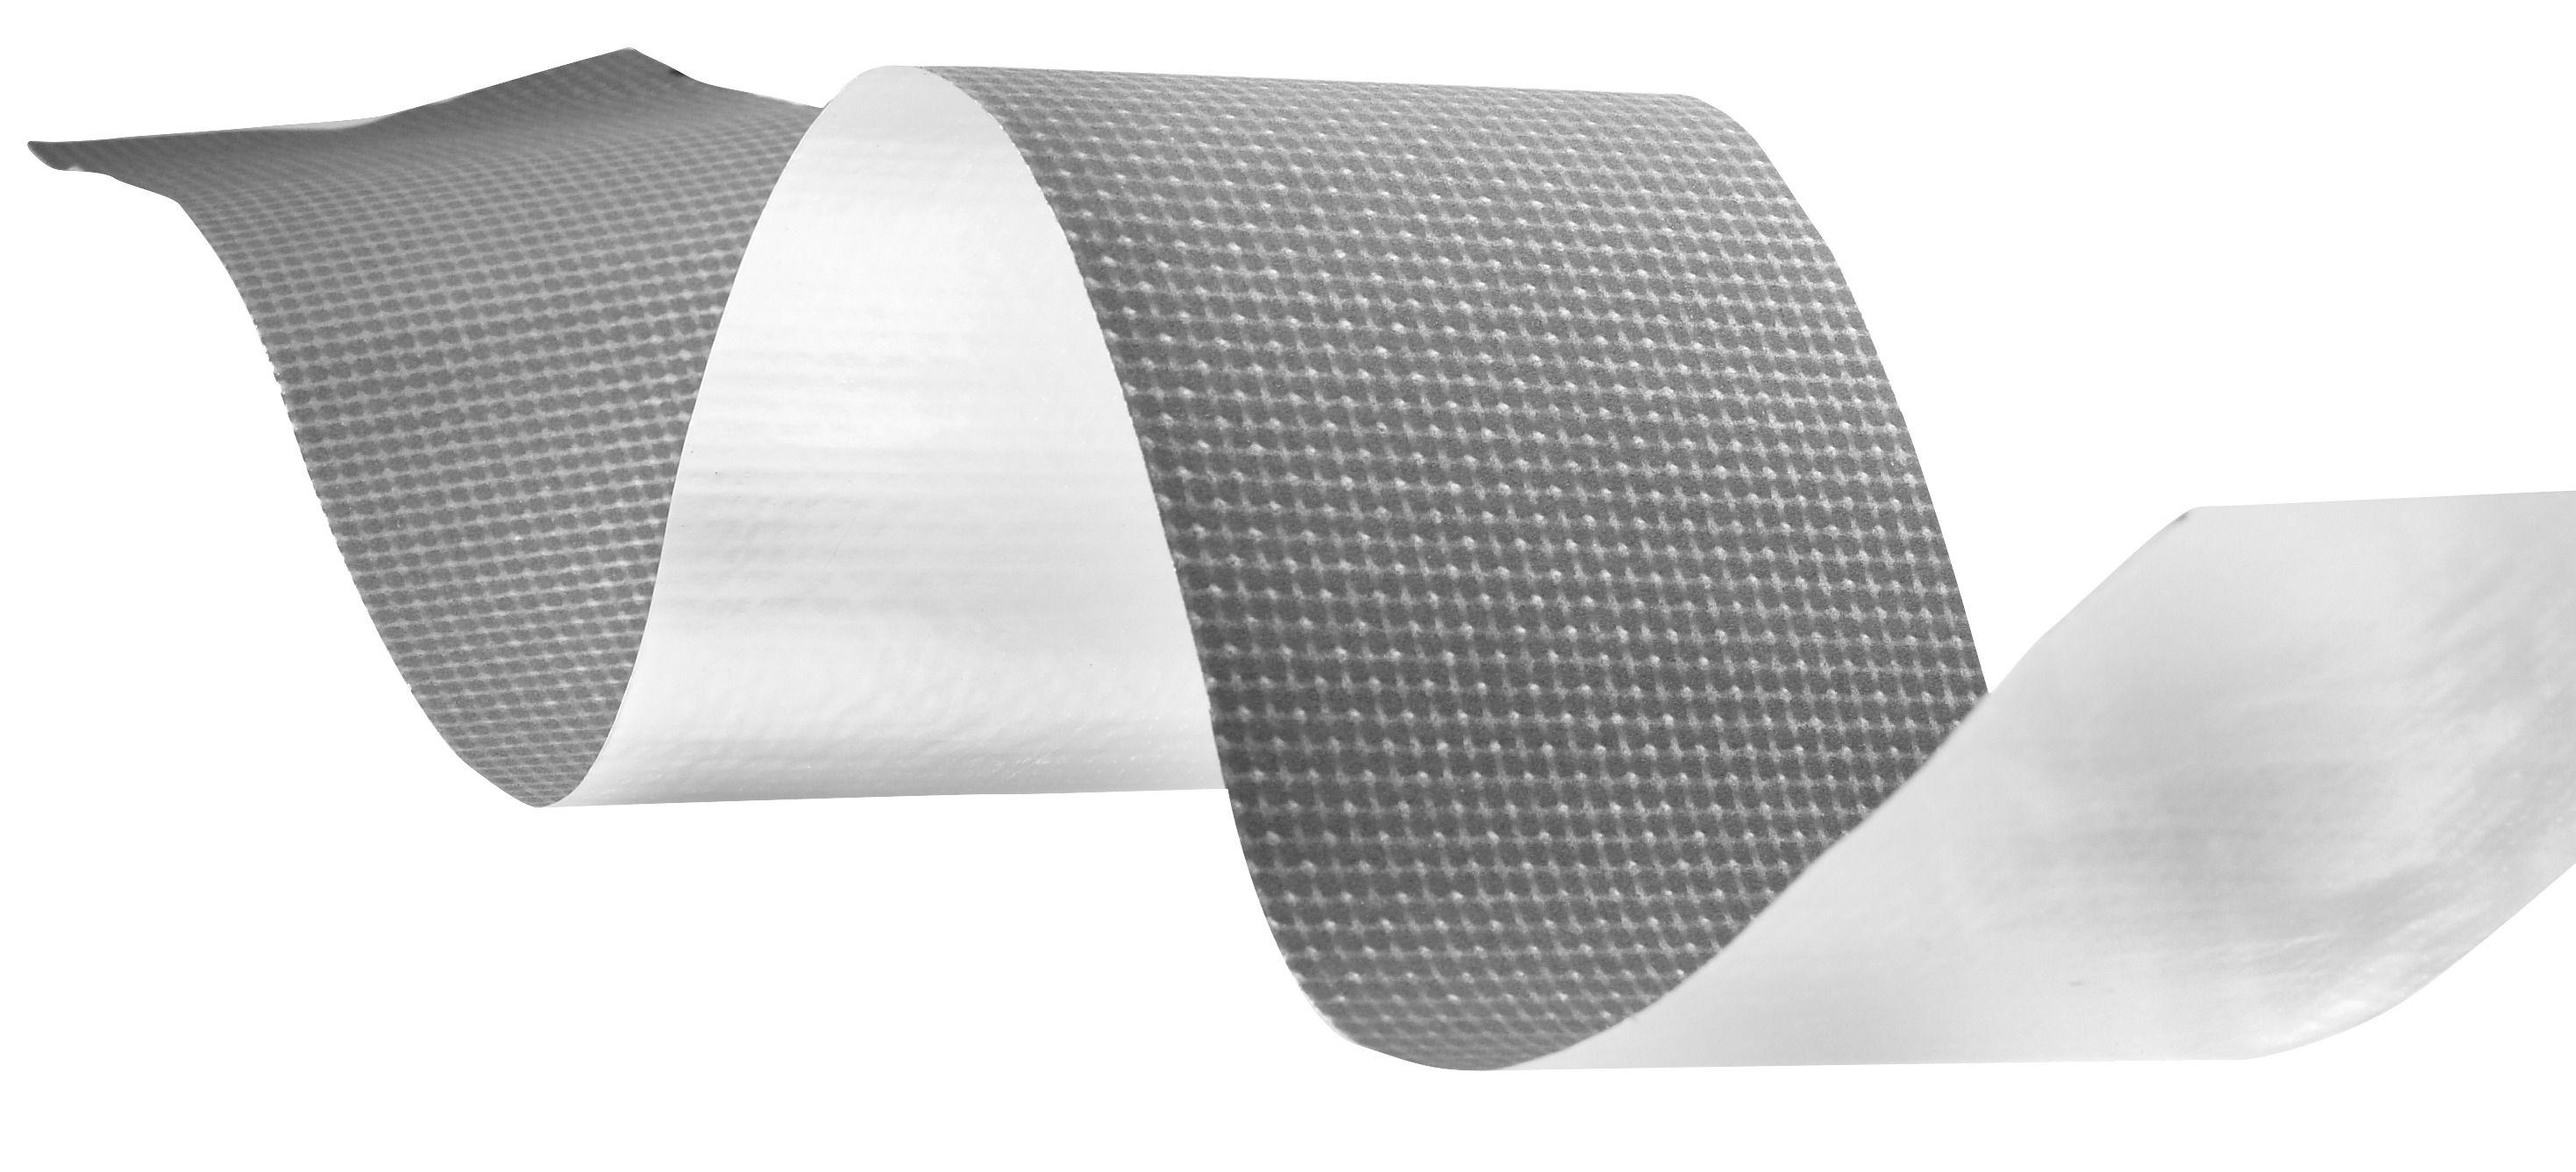 Zircoflex Is A Flexible Ceramic Heat Shield Material That